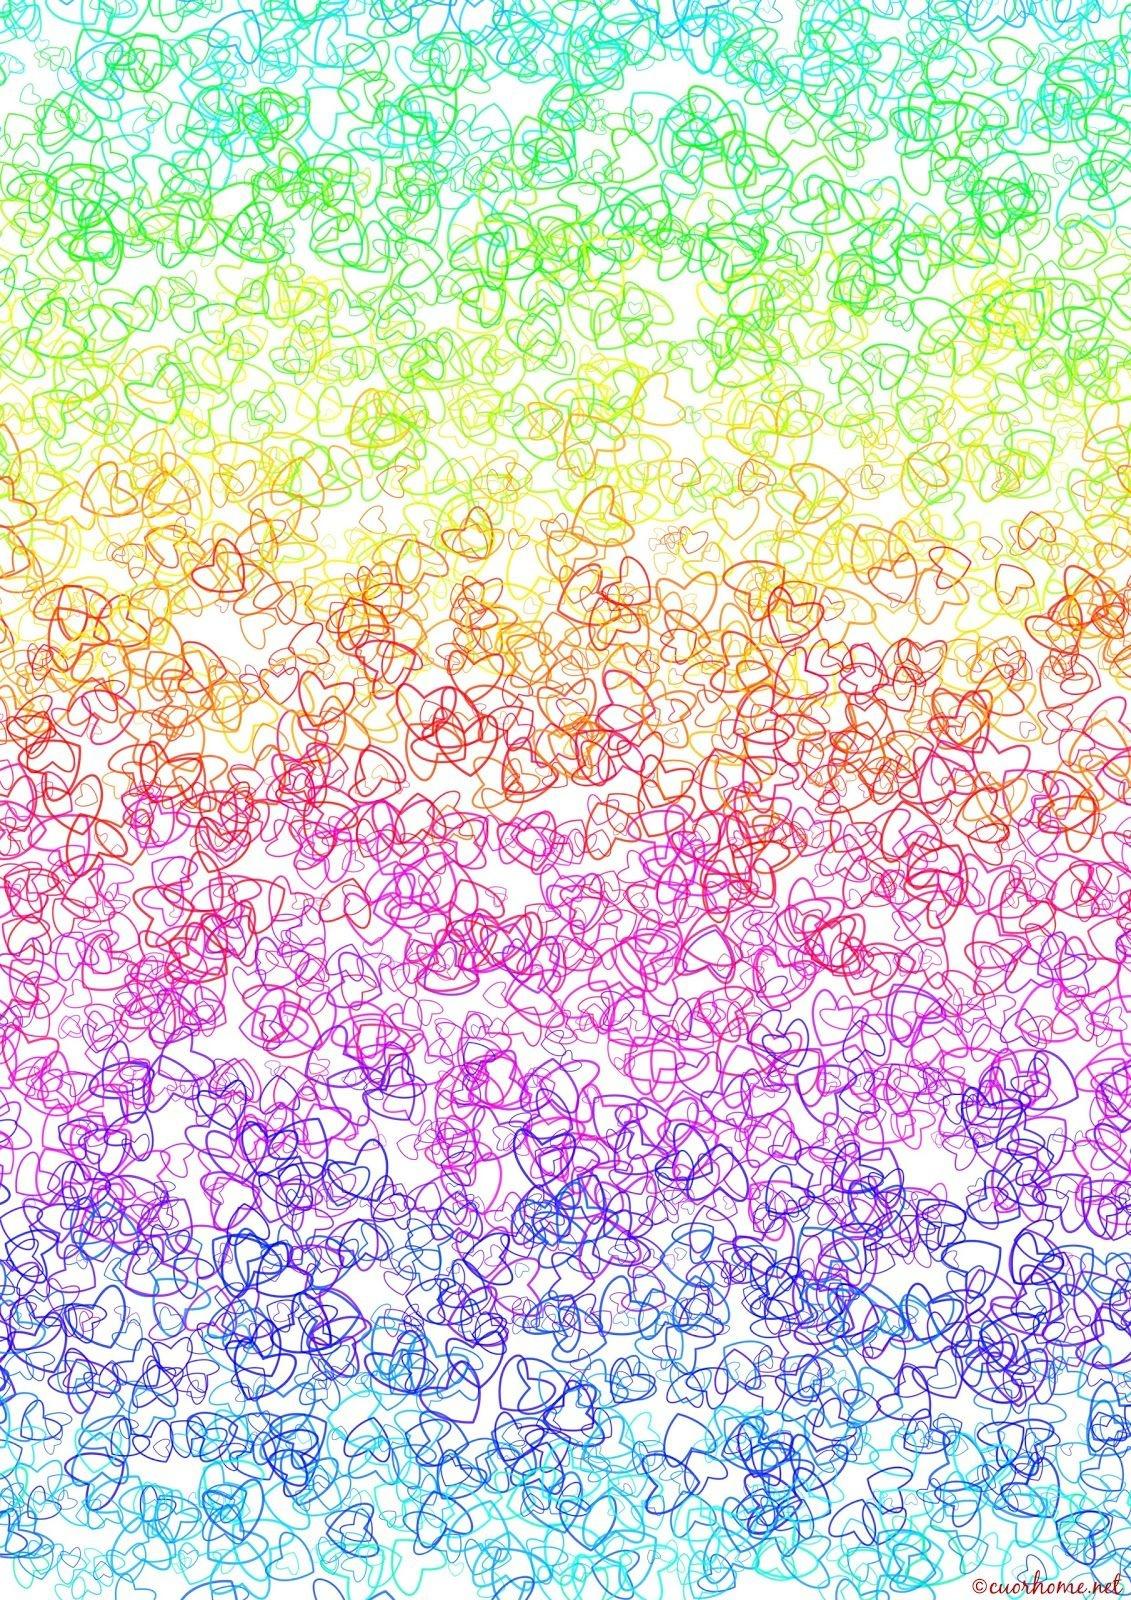 Background Paper Free Printable7 | Scrapbooking | Paper Background - Free Printable Backgrounds